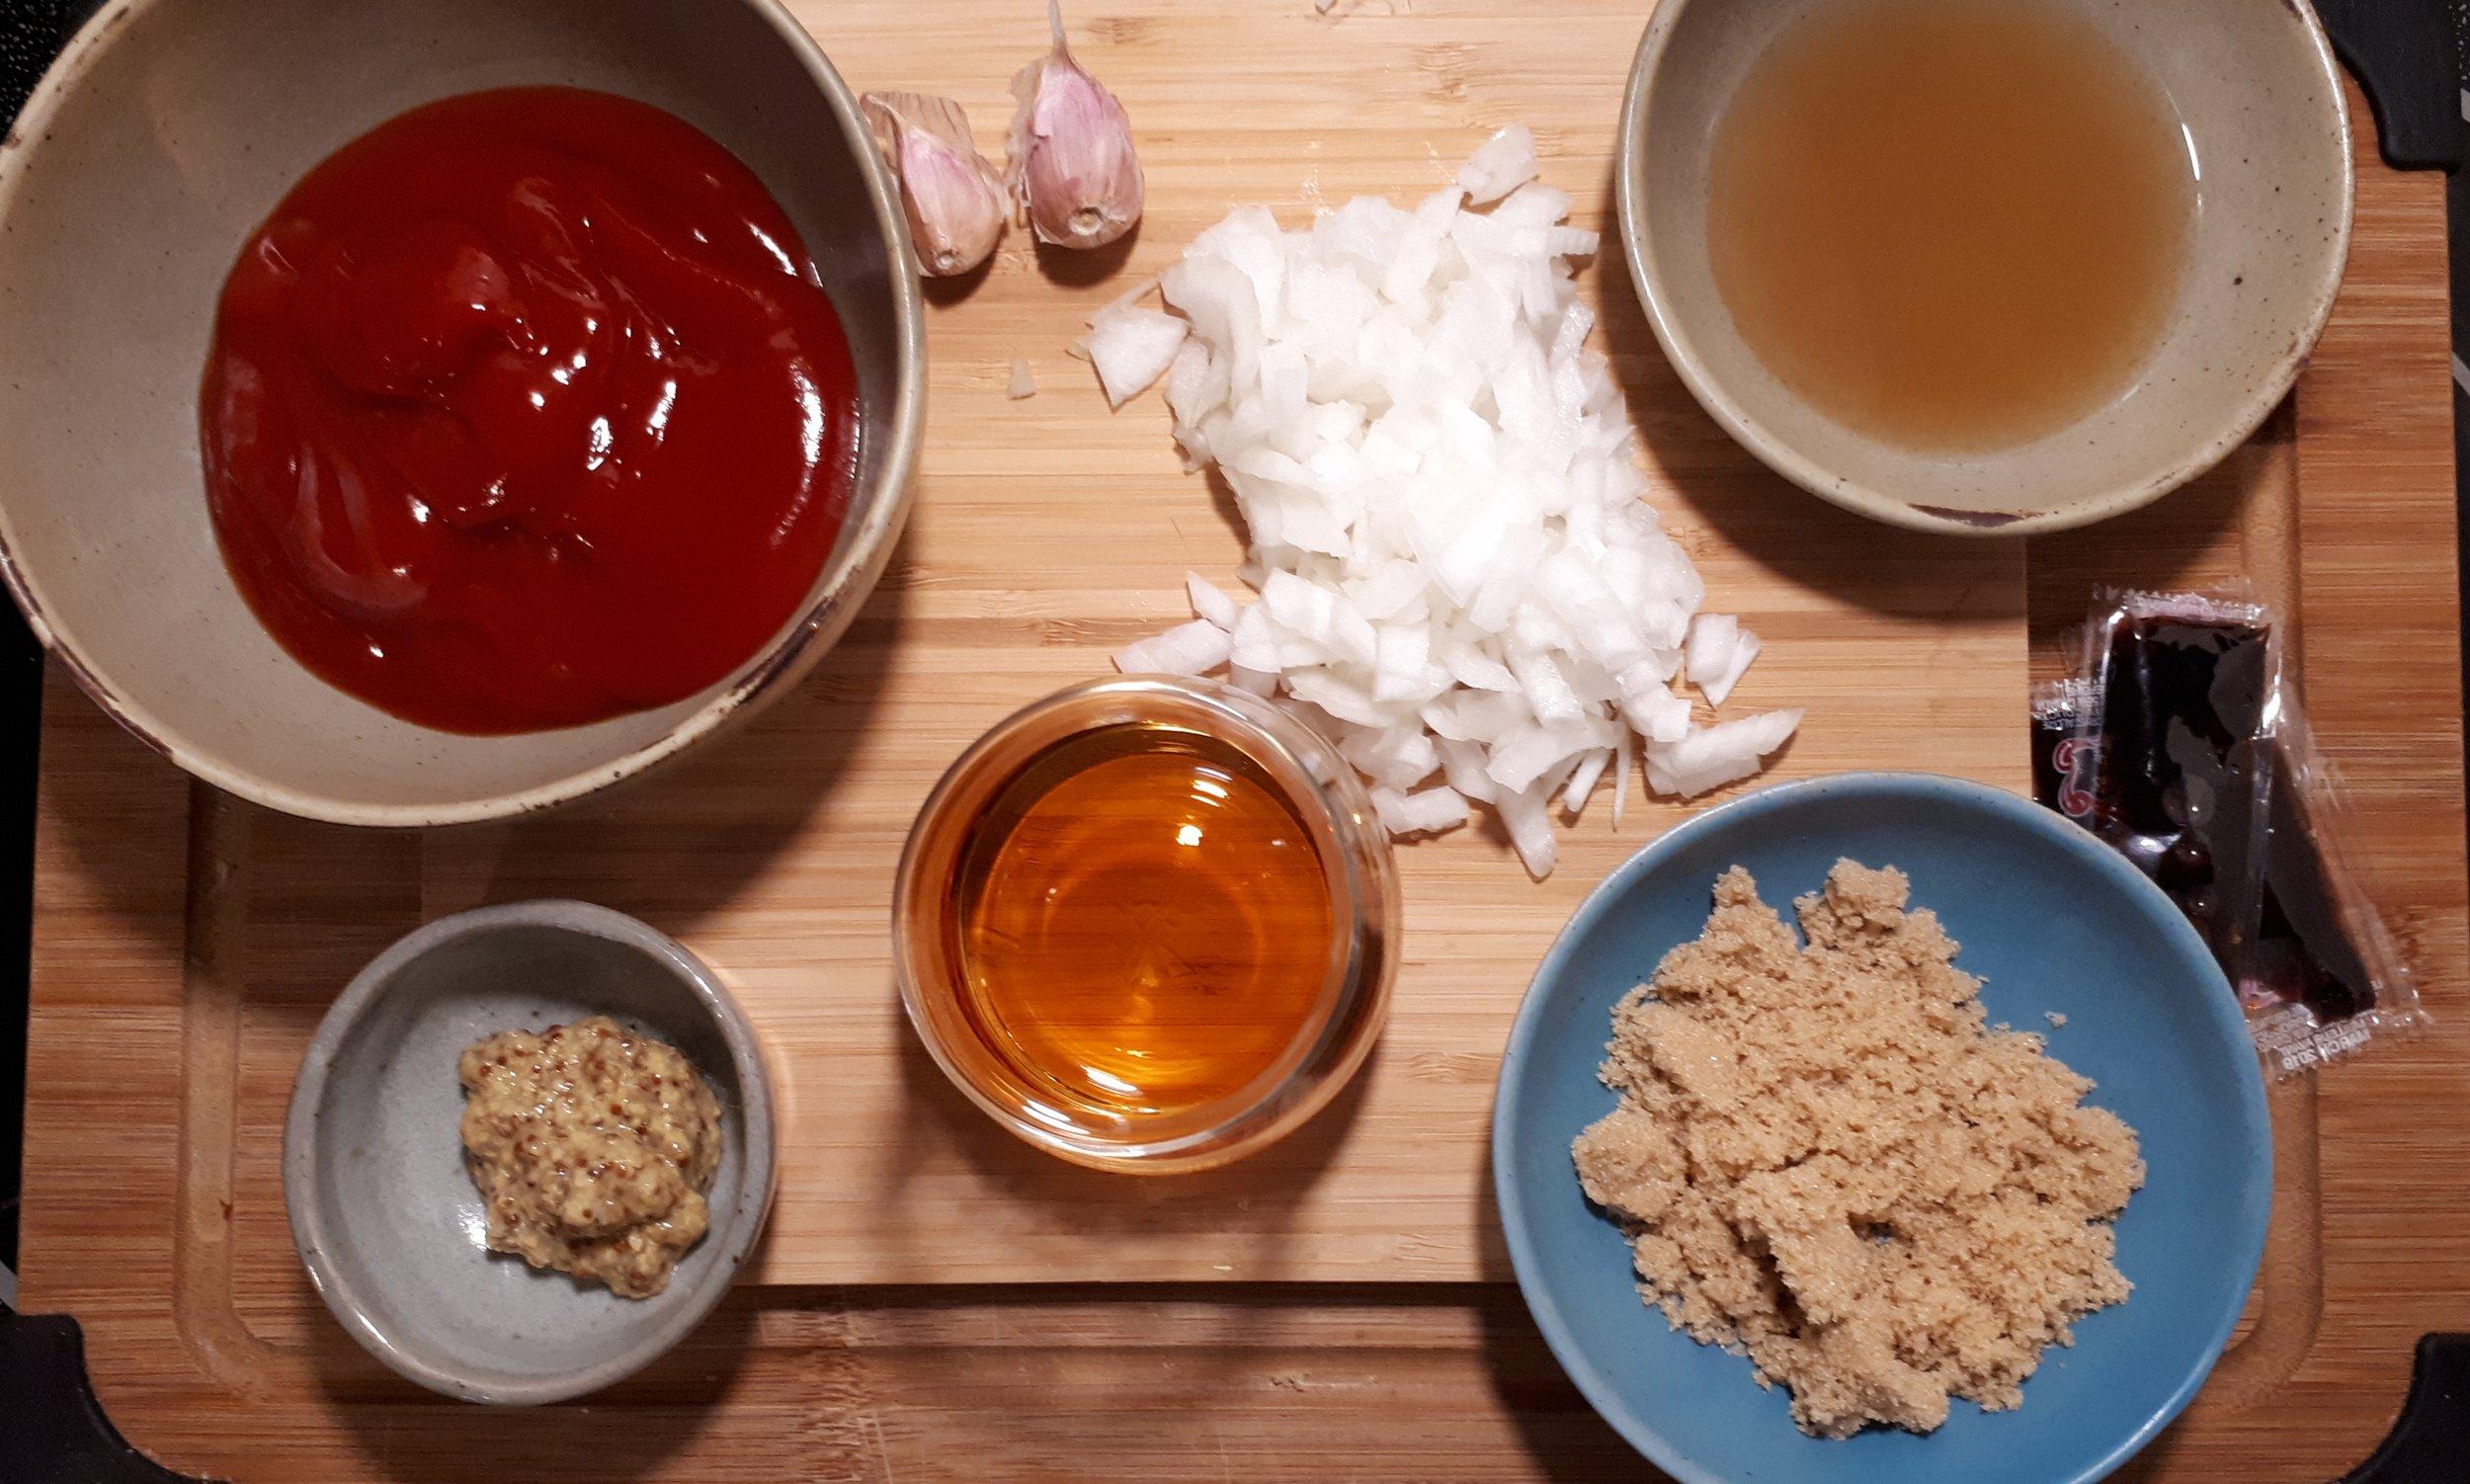 bbq sauce ingredients - Copy.jpg